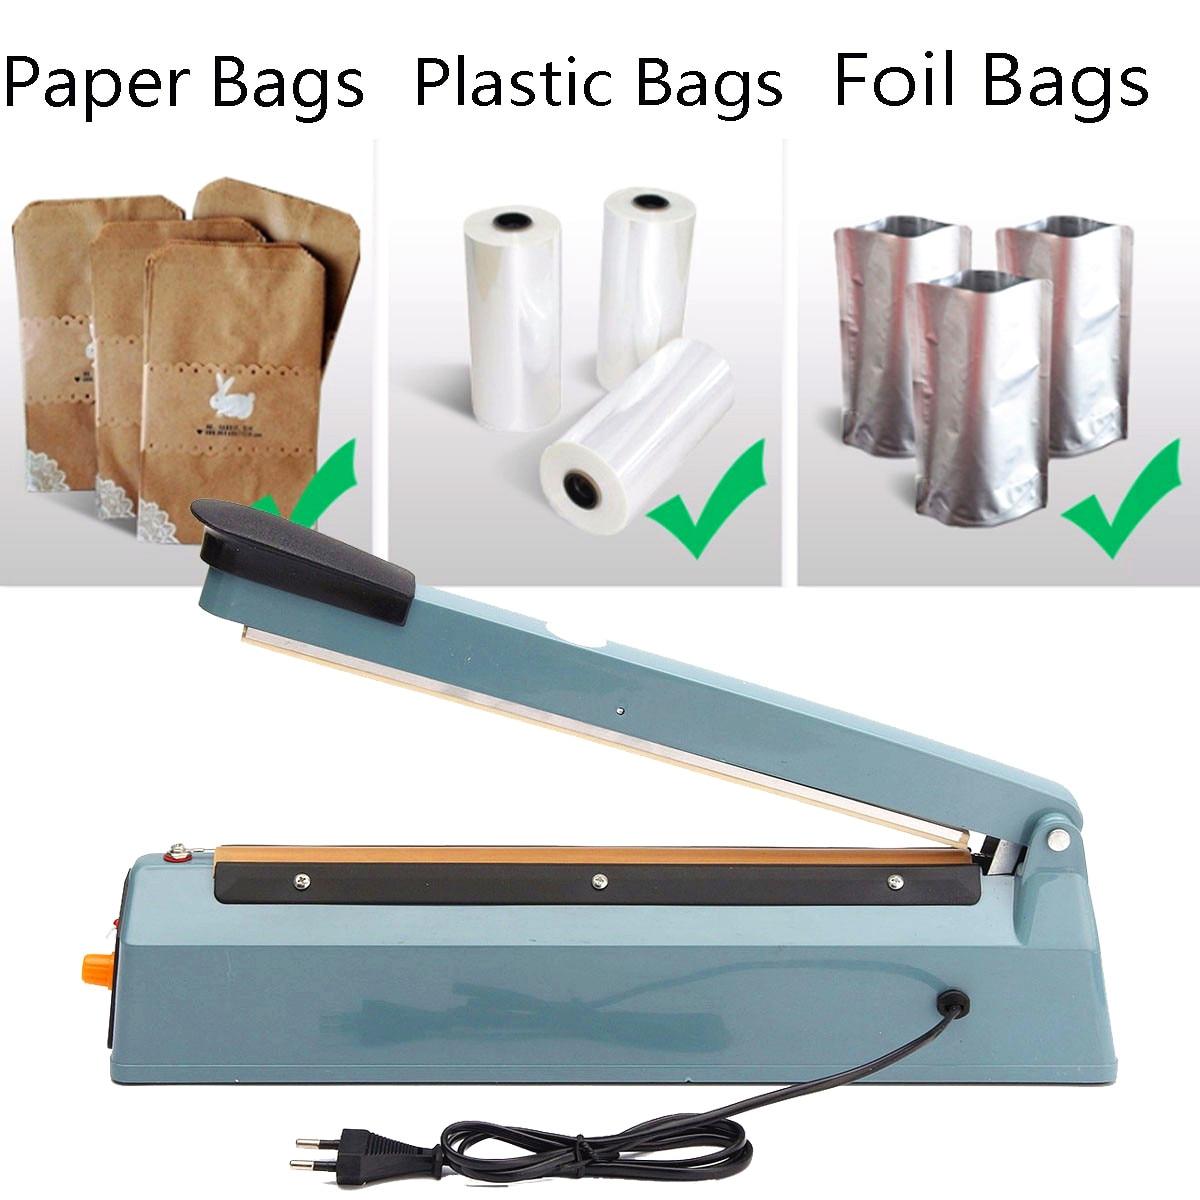 220V 400W Hand Pressure Sealer Machine Impulse Sealer Poly Bag Plastic Closer Sealing Wrap for Home Kitchen Dropshipping